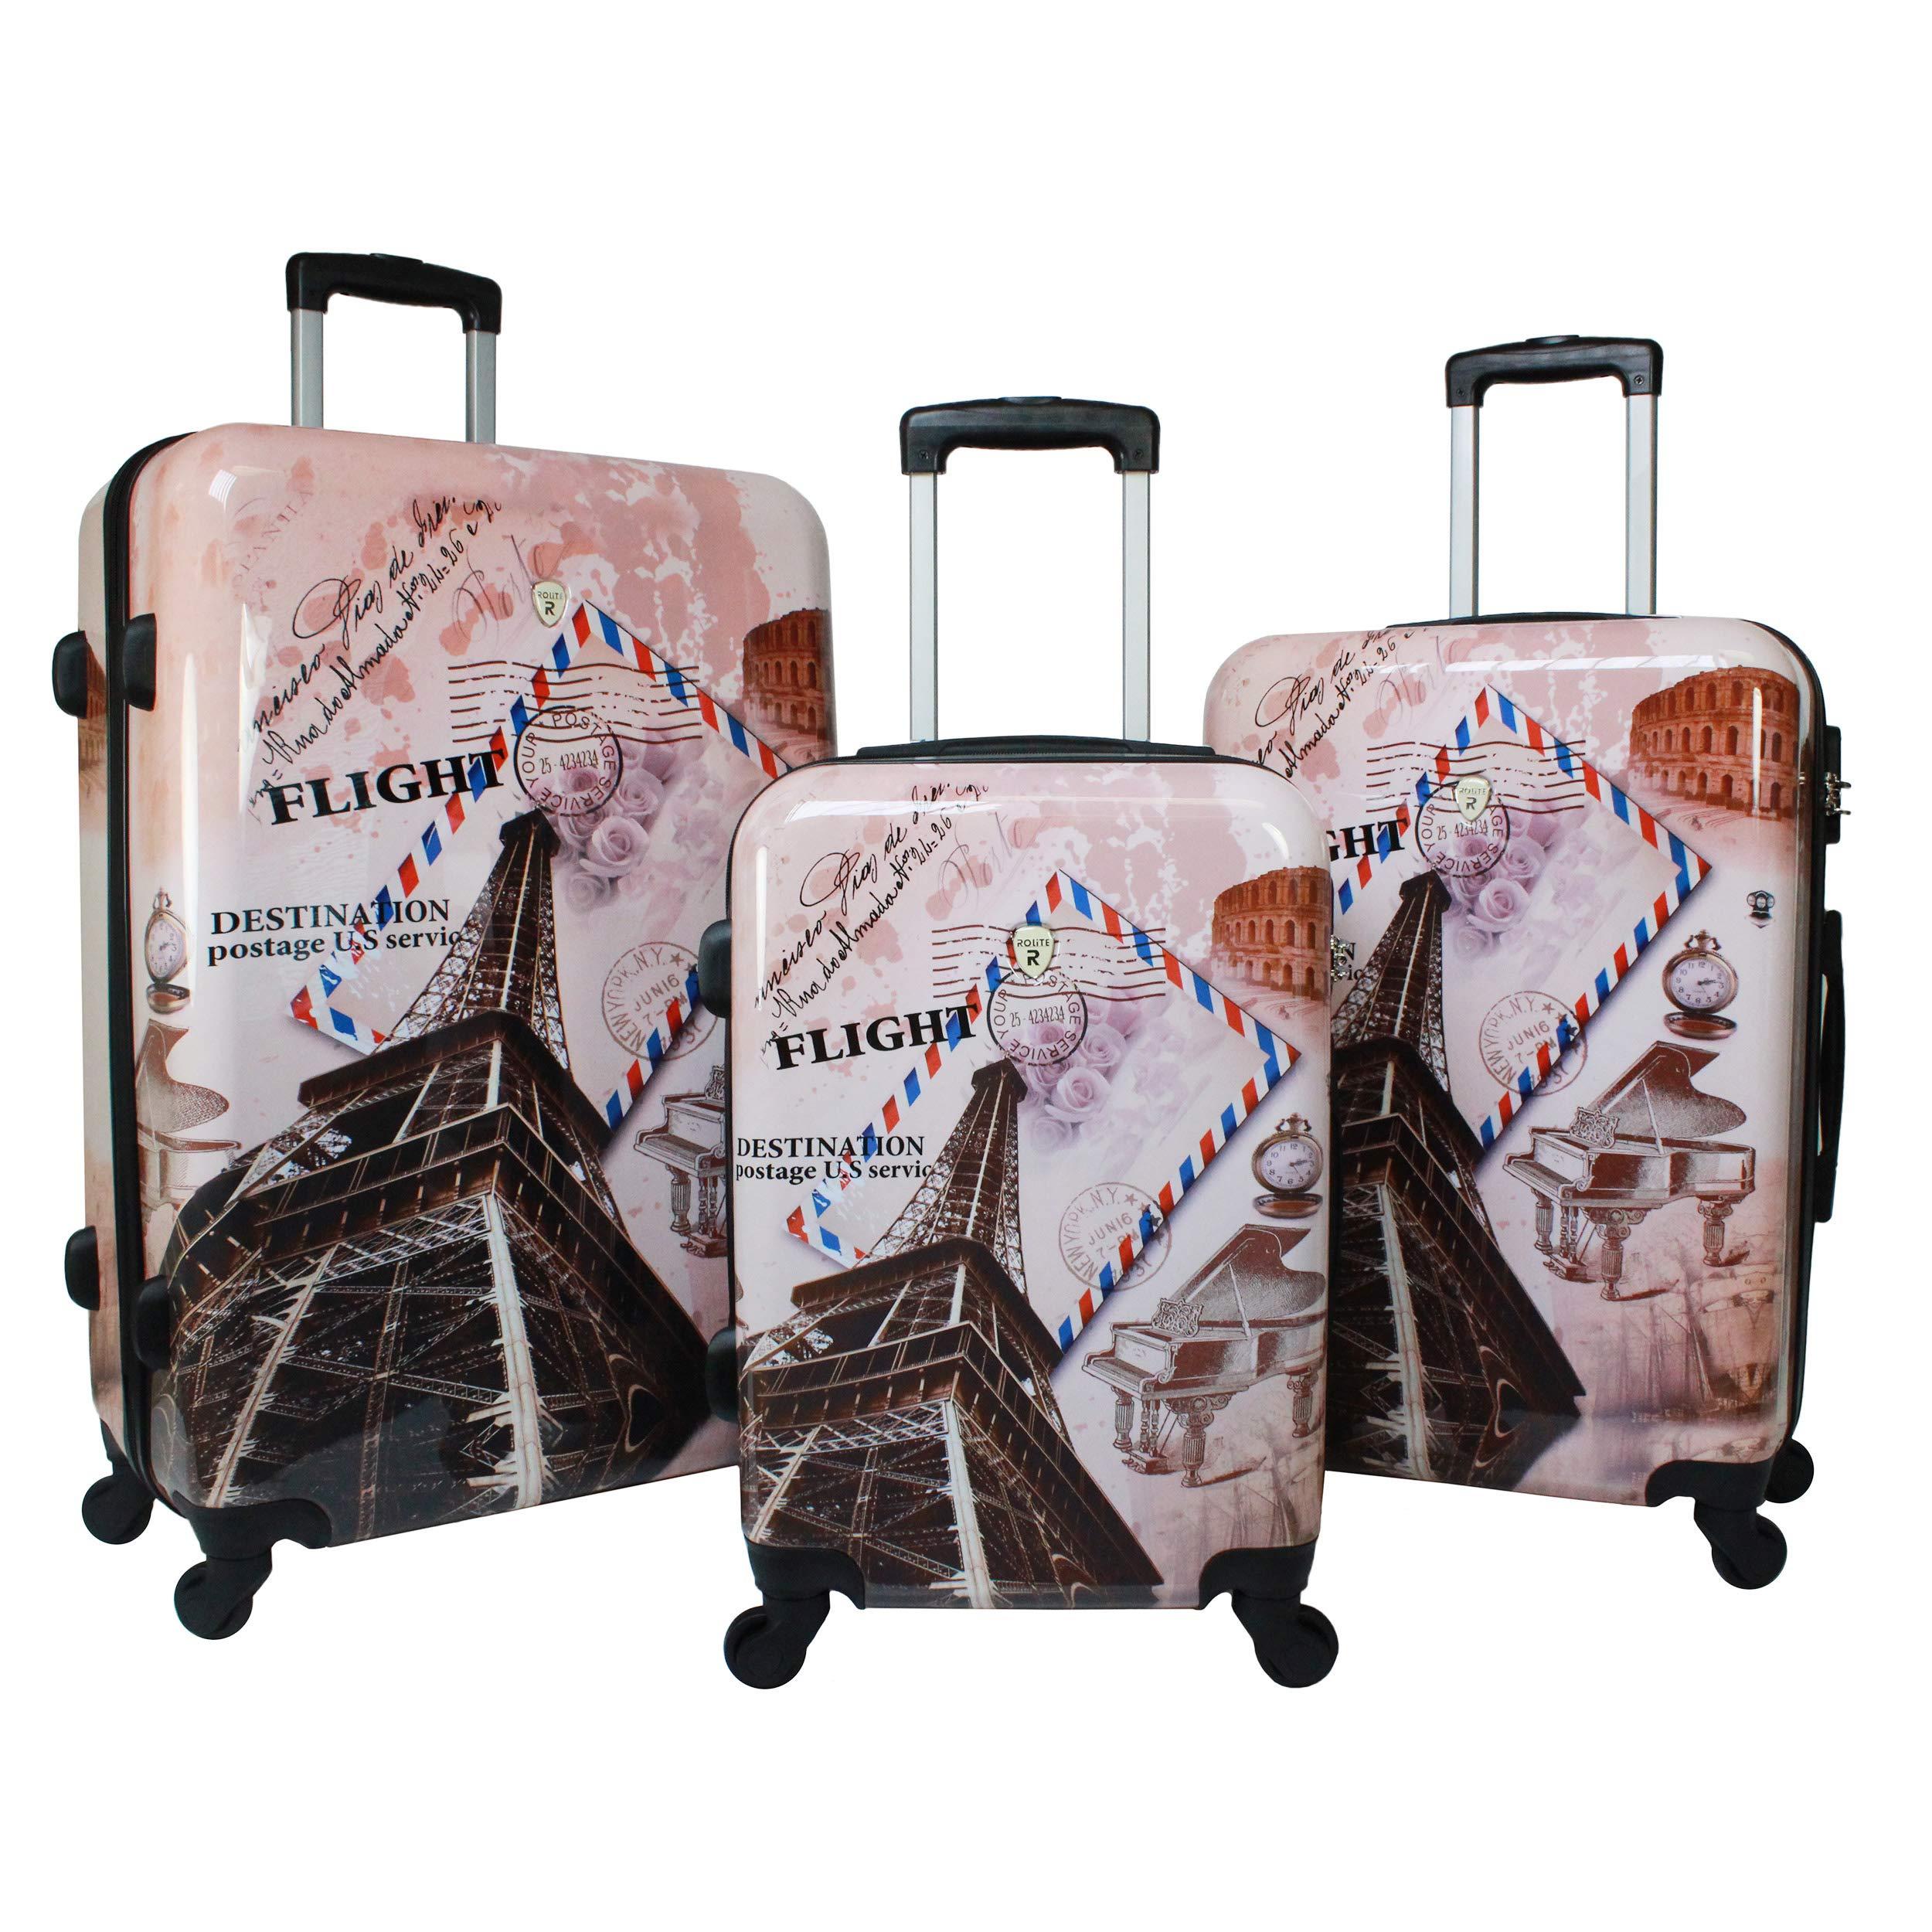 World Traveler Collection 3 Piece Hardside